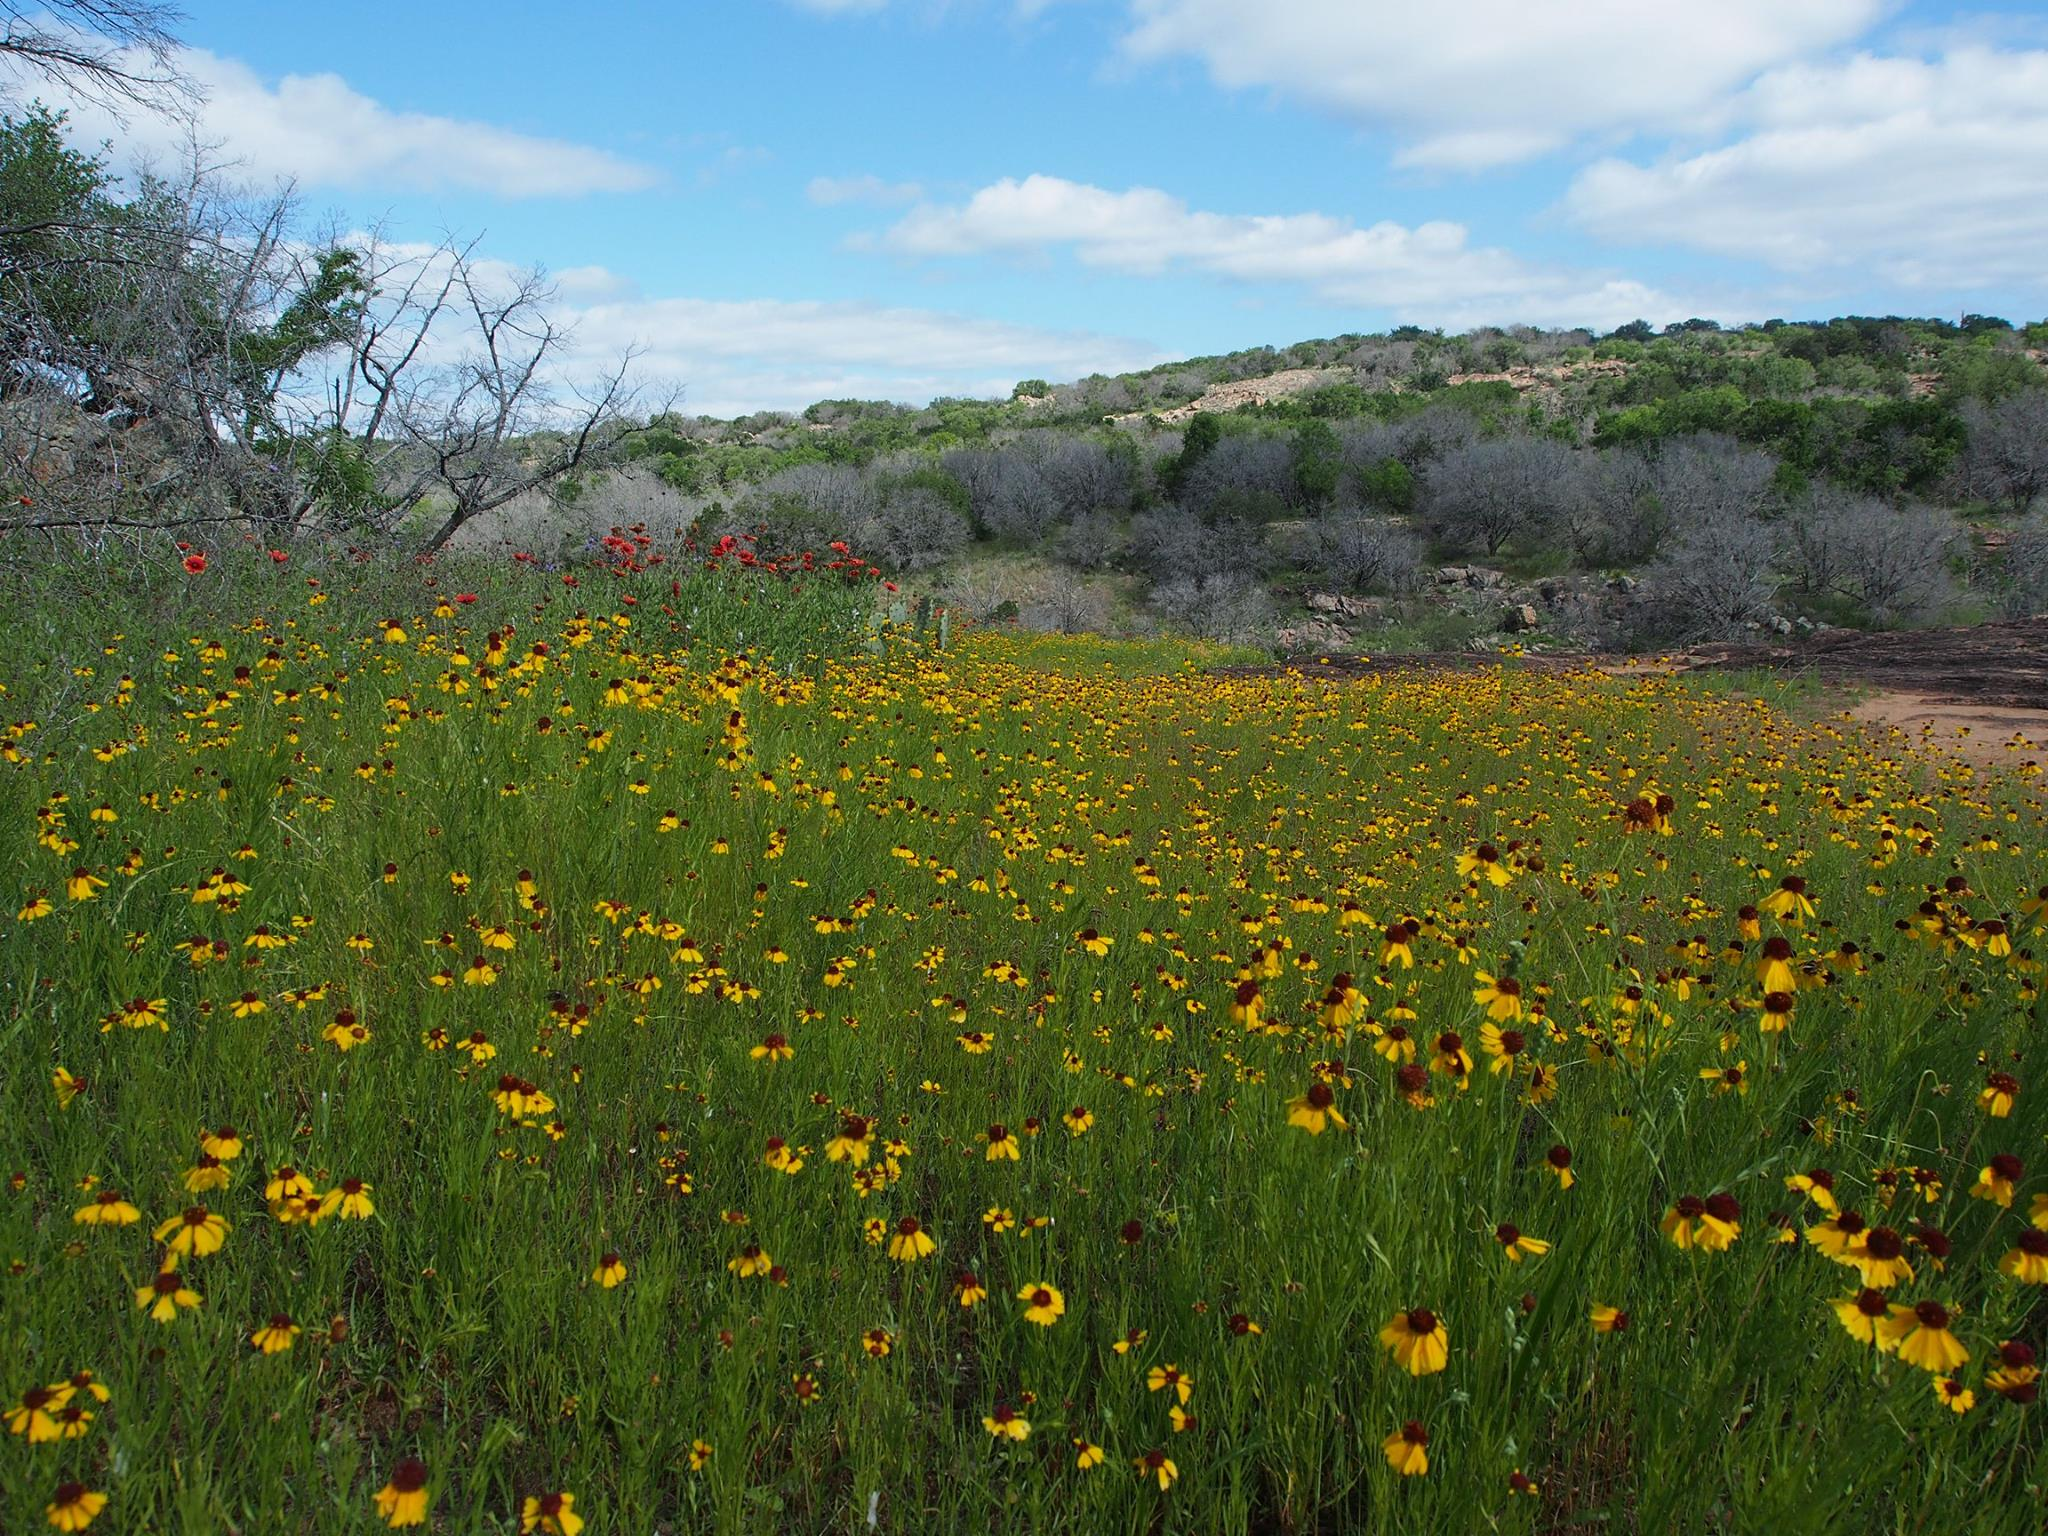 wildflowers-inks-lake-state-park